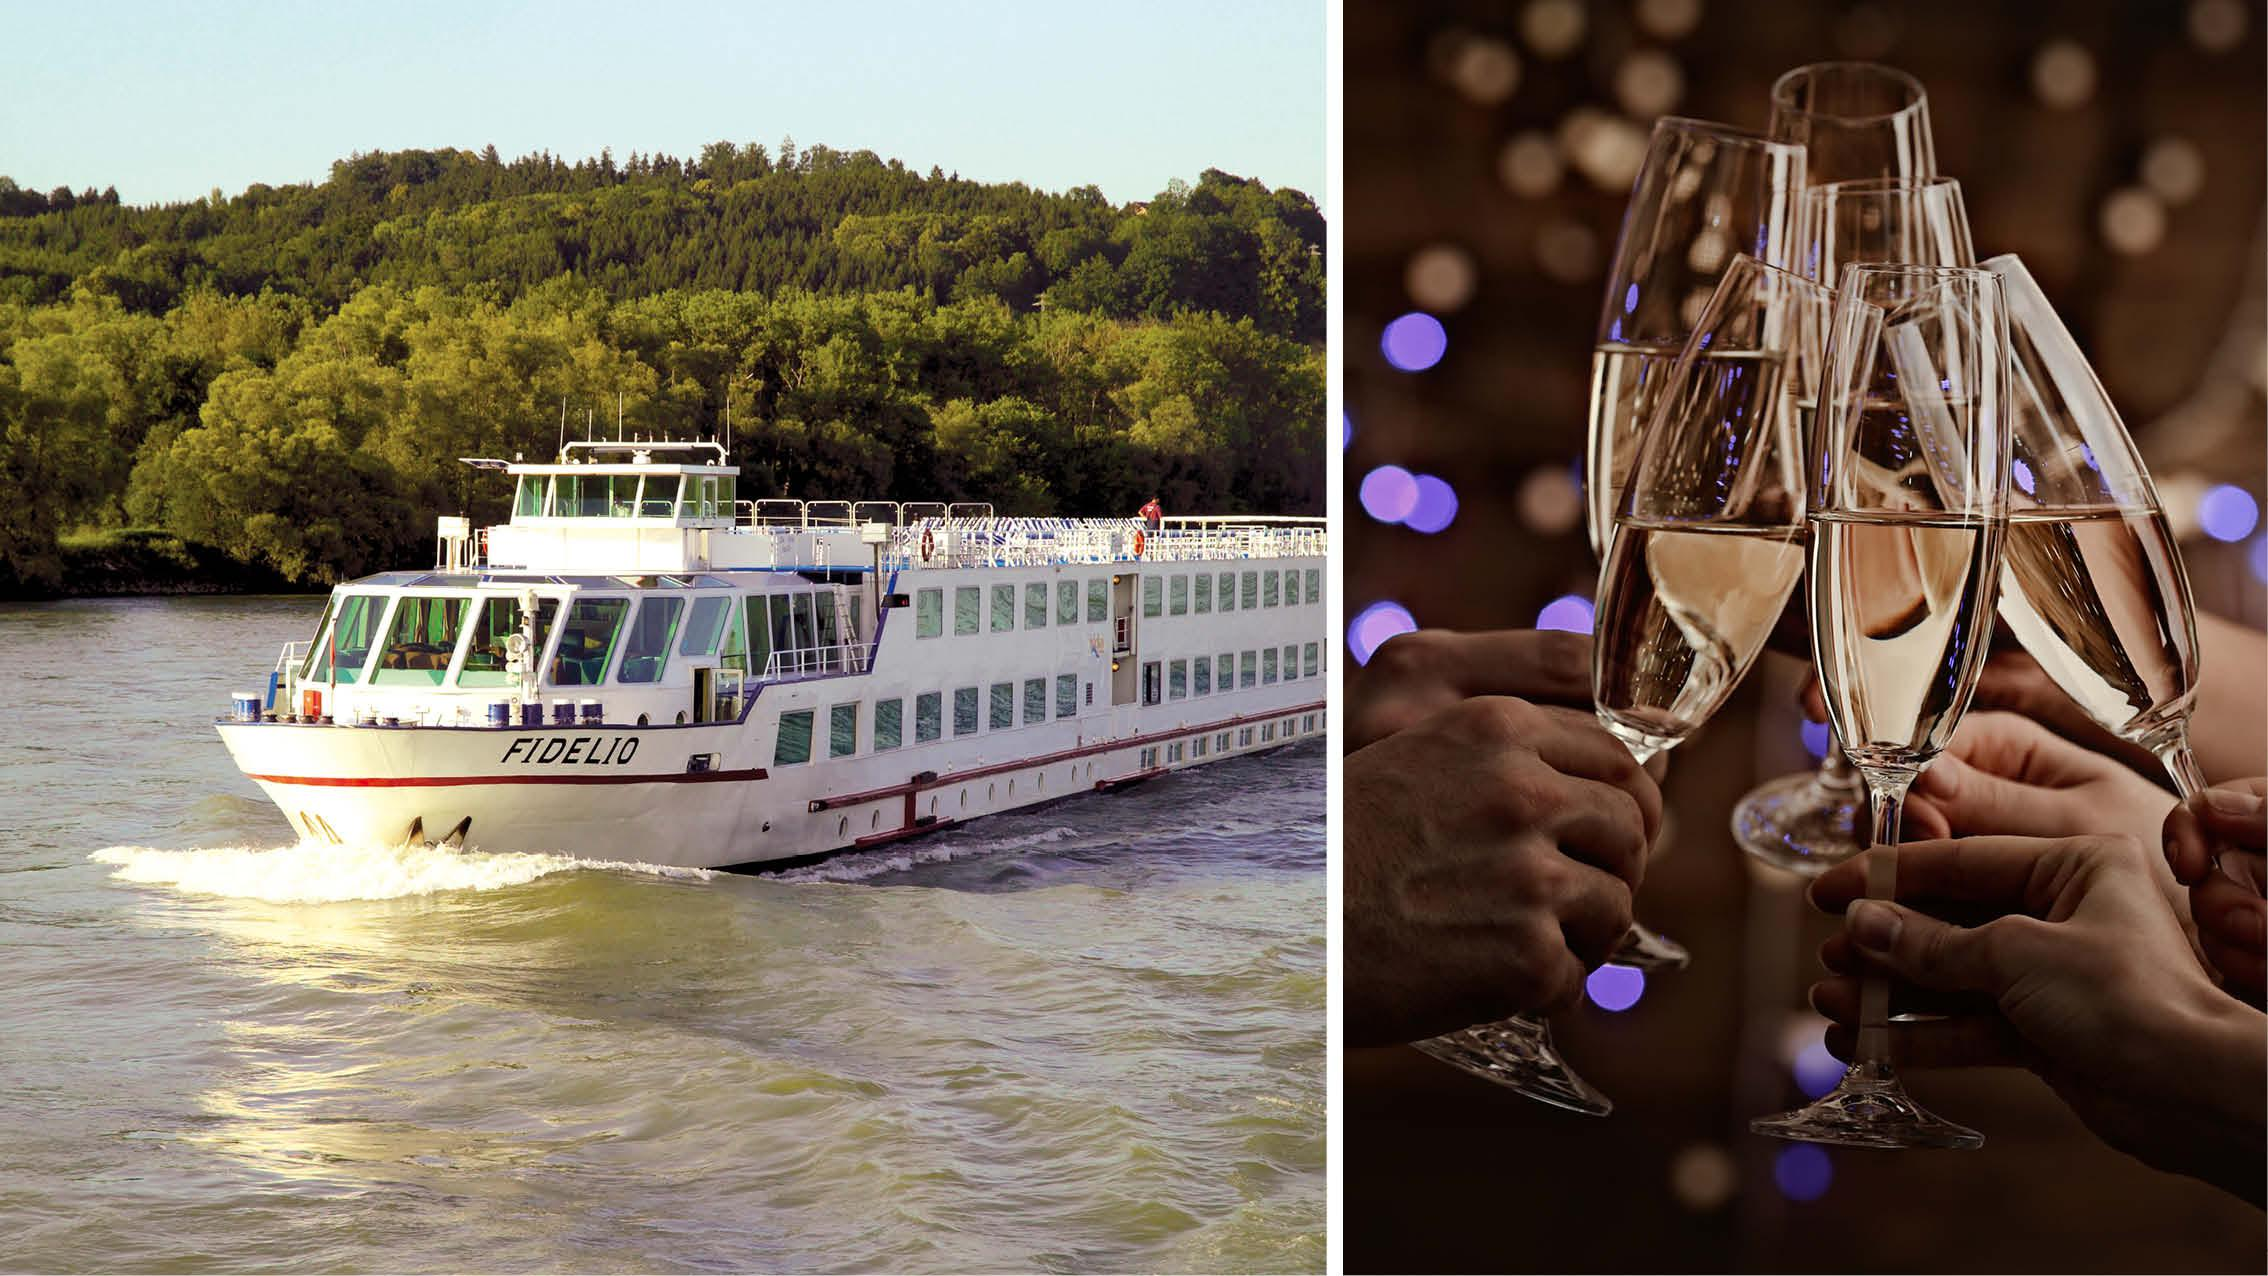 Fejr nytårsaften på Donaufloden med Kulturrejser Europa